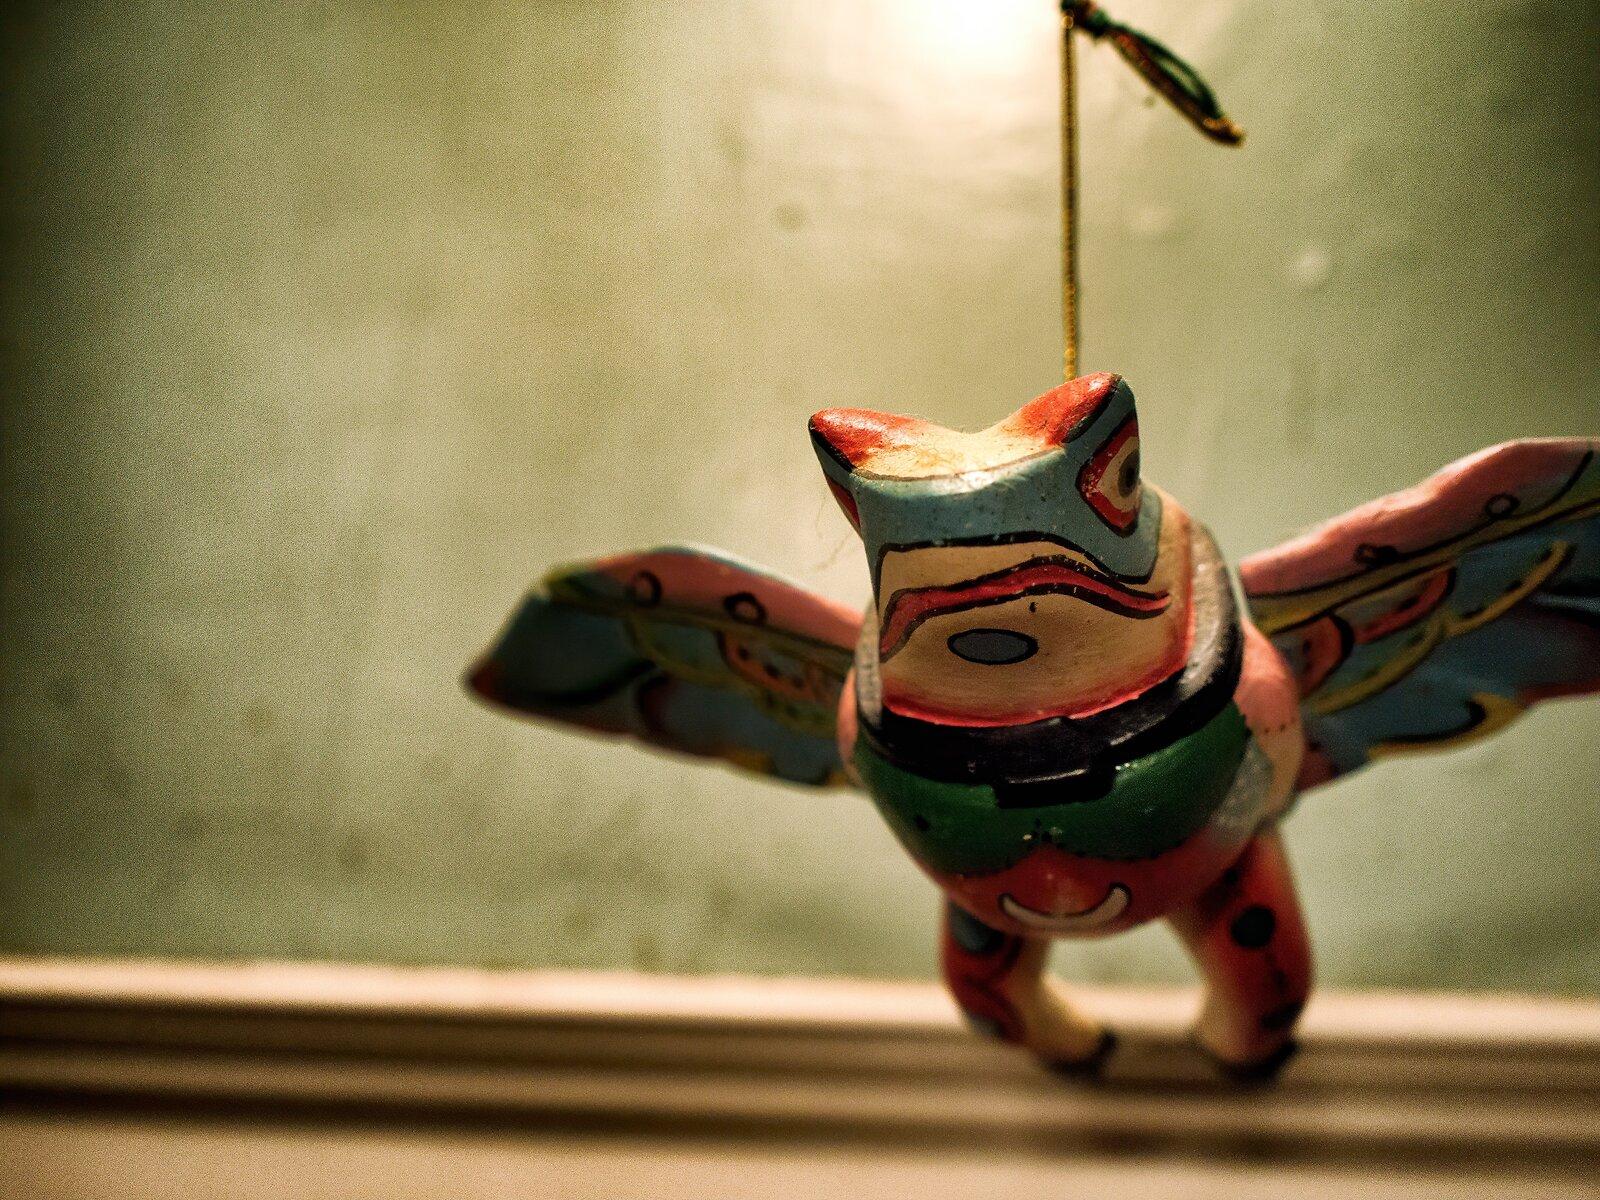 EP3_Nov13_Flying_Frog.jpg